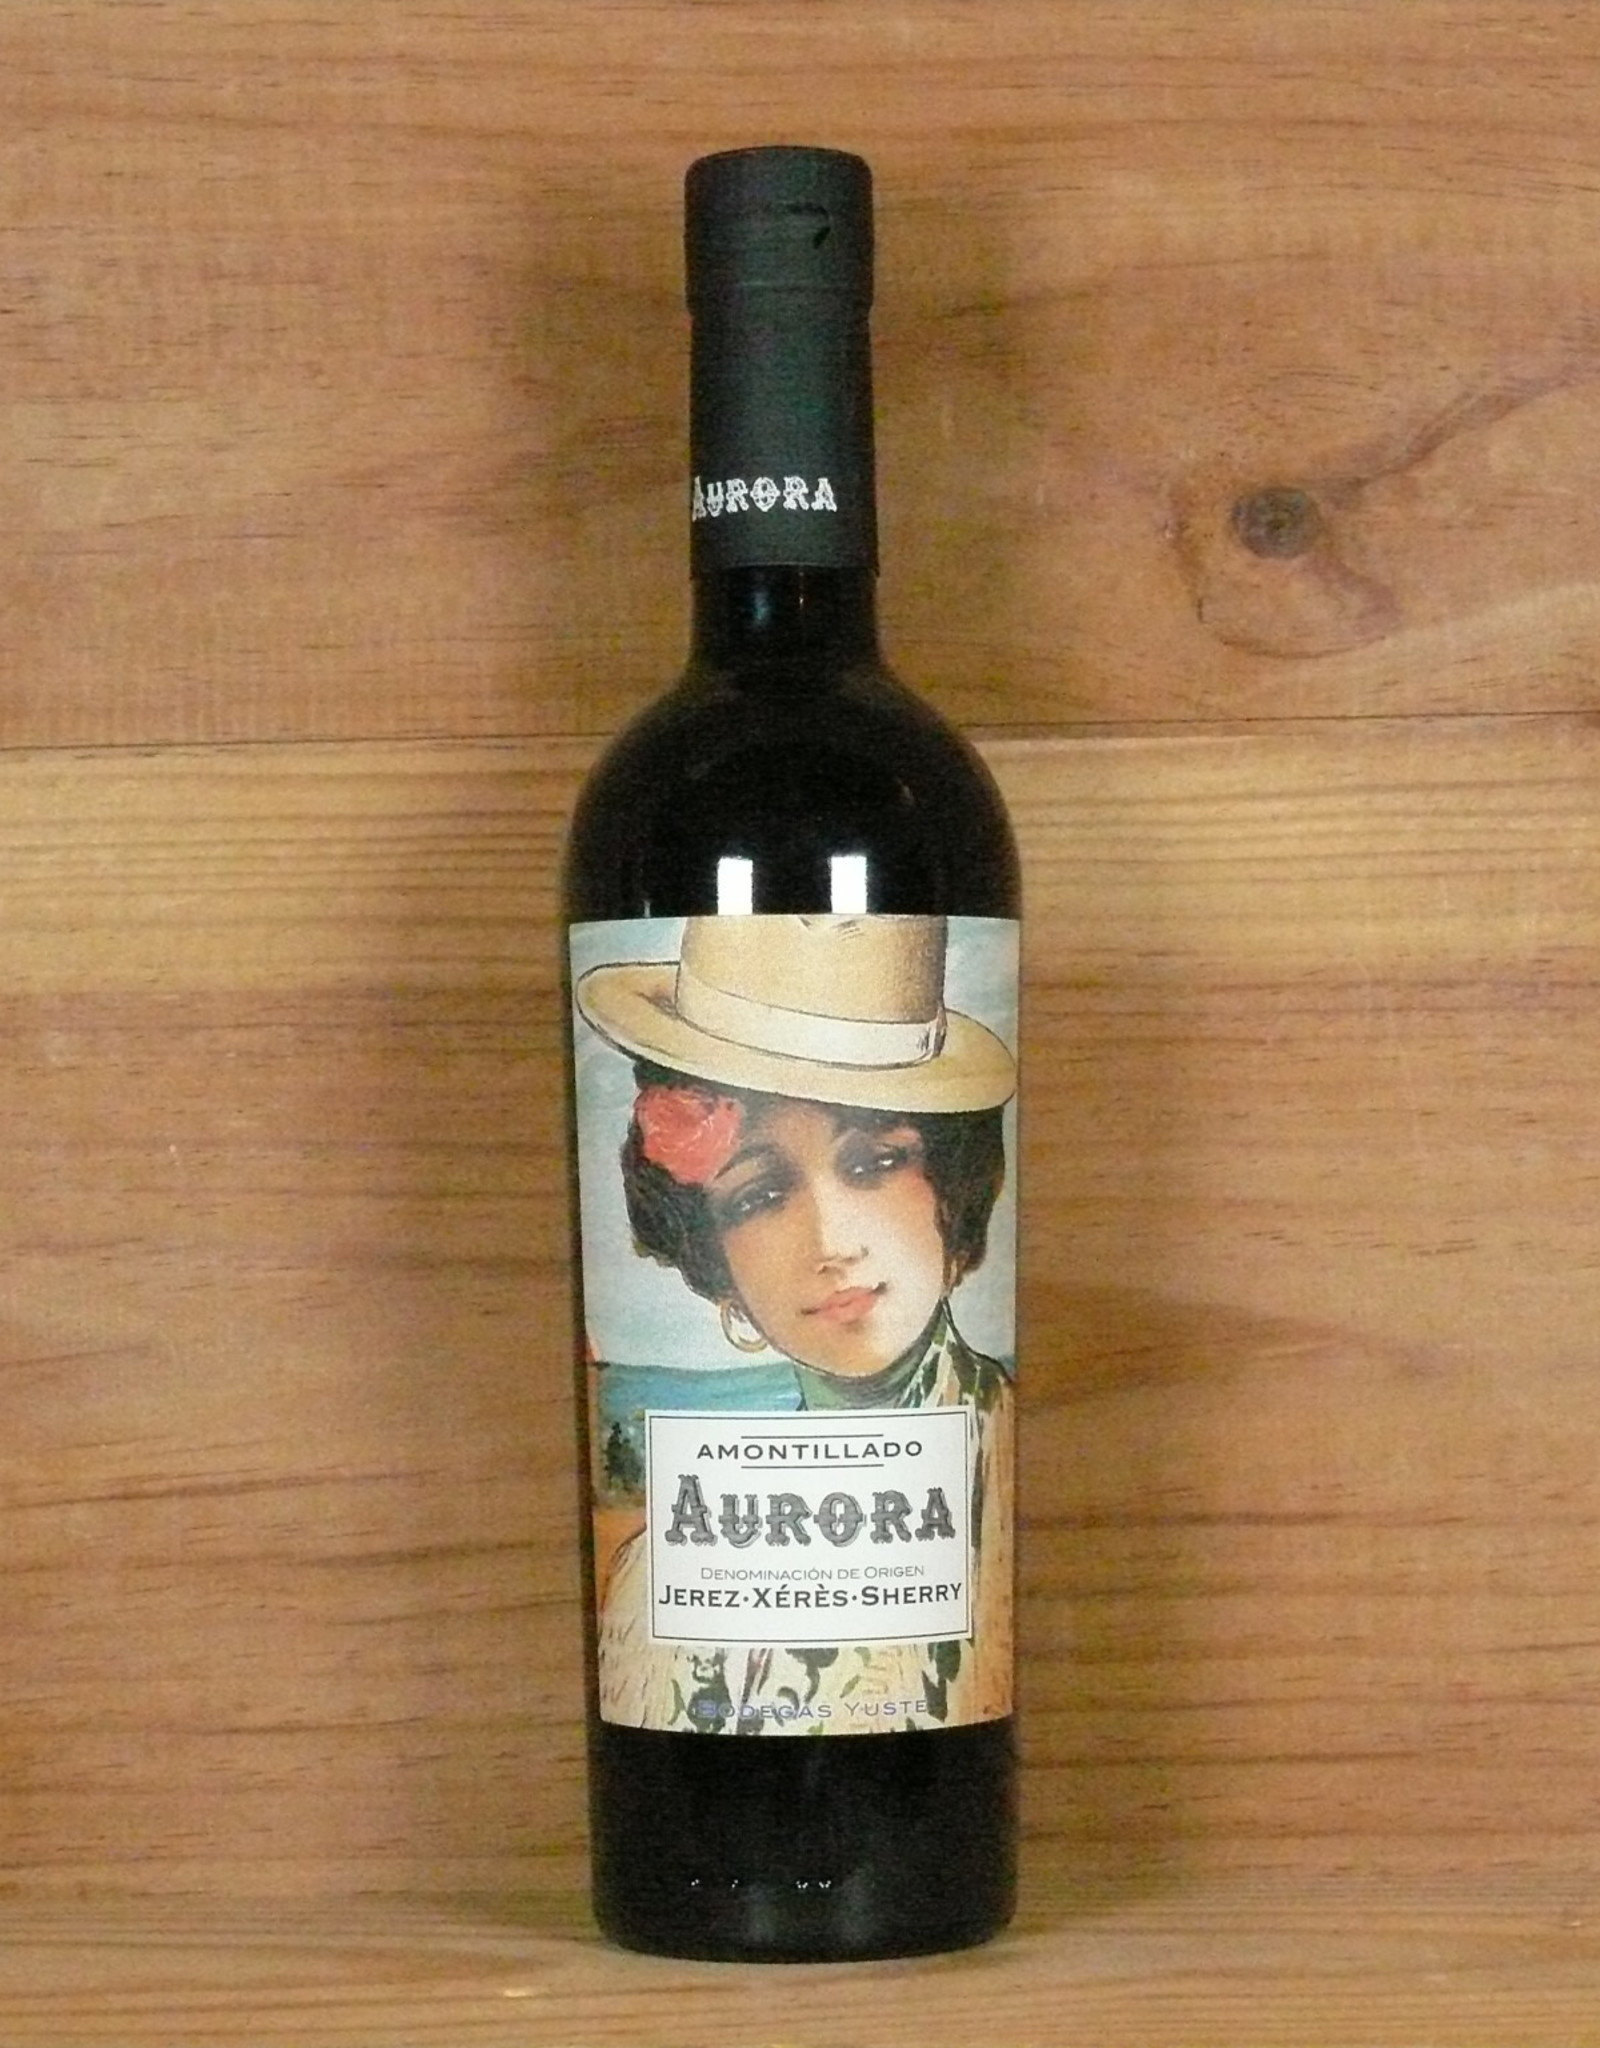 Bodegas Yuste 'Aurora' Amontillado Sherry